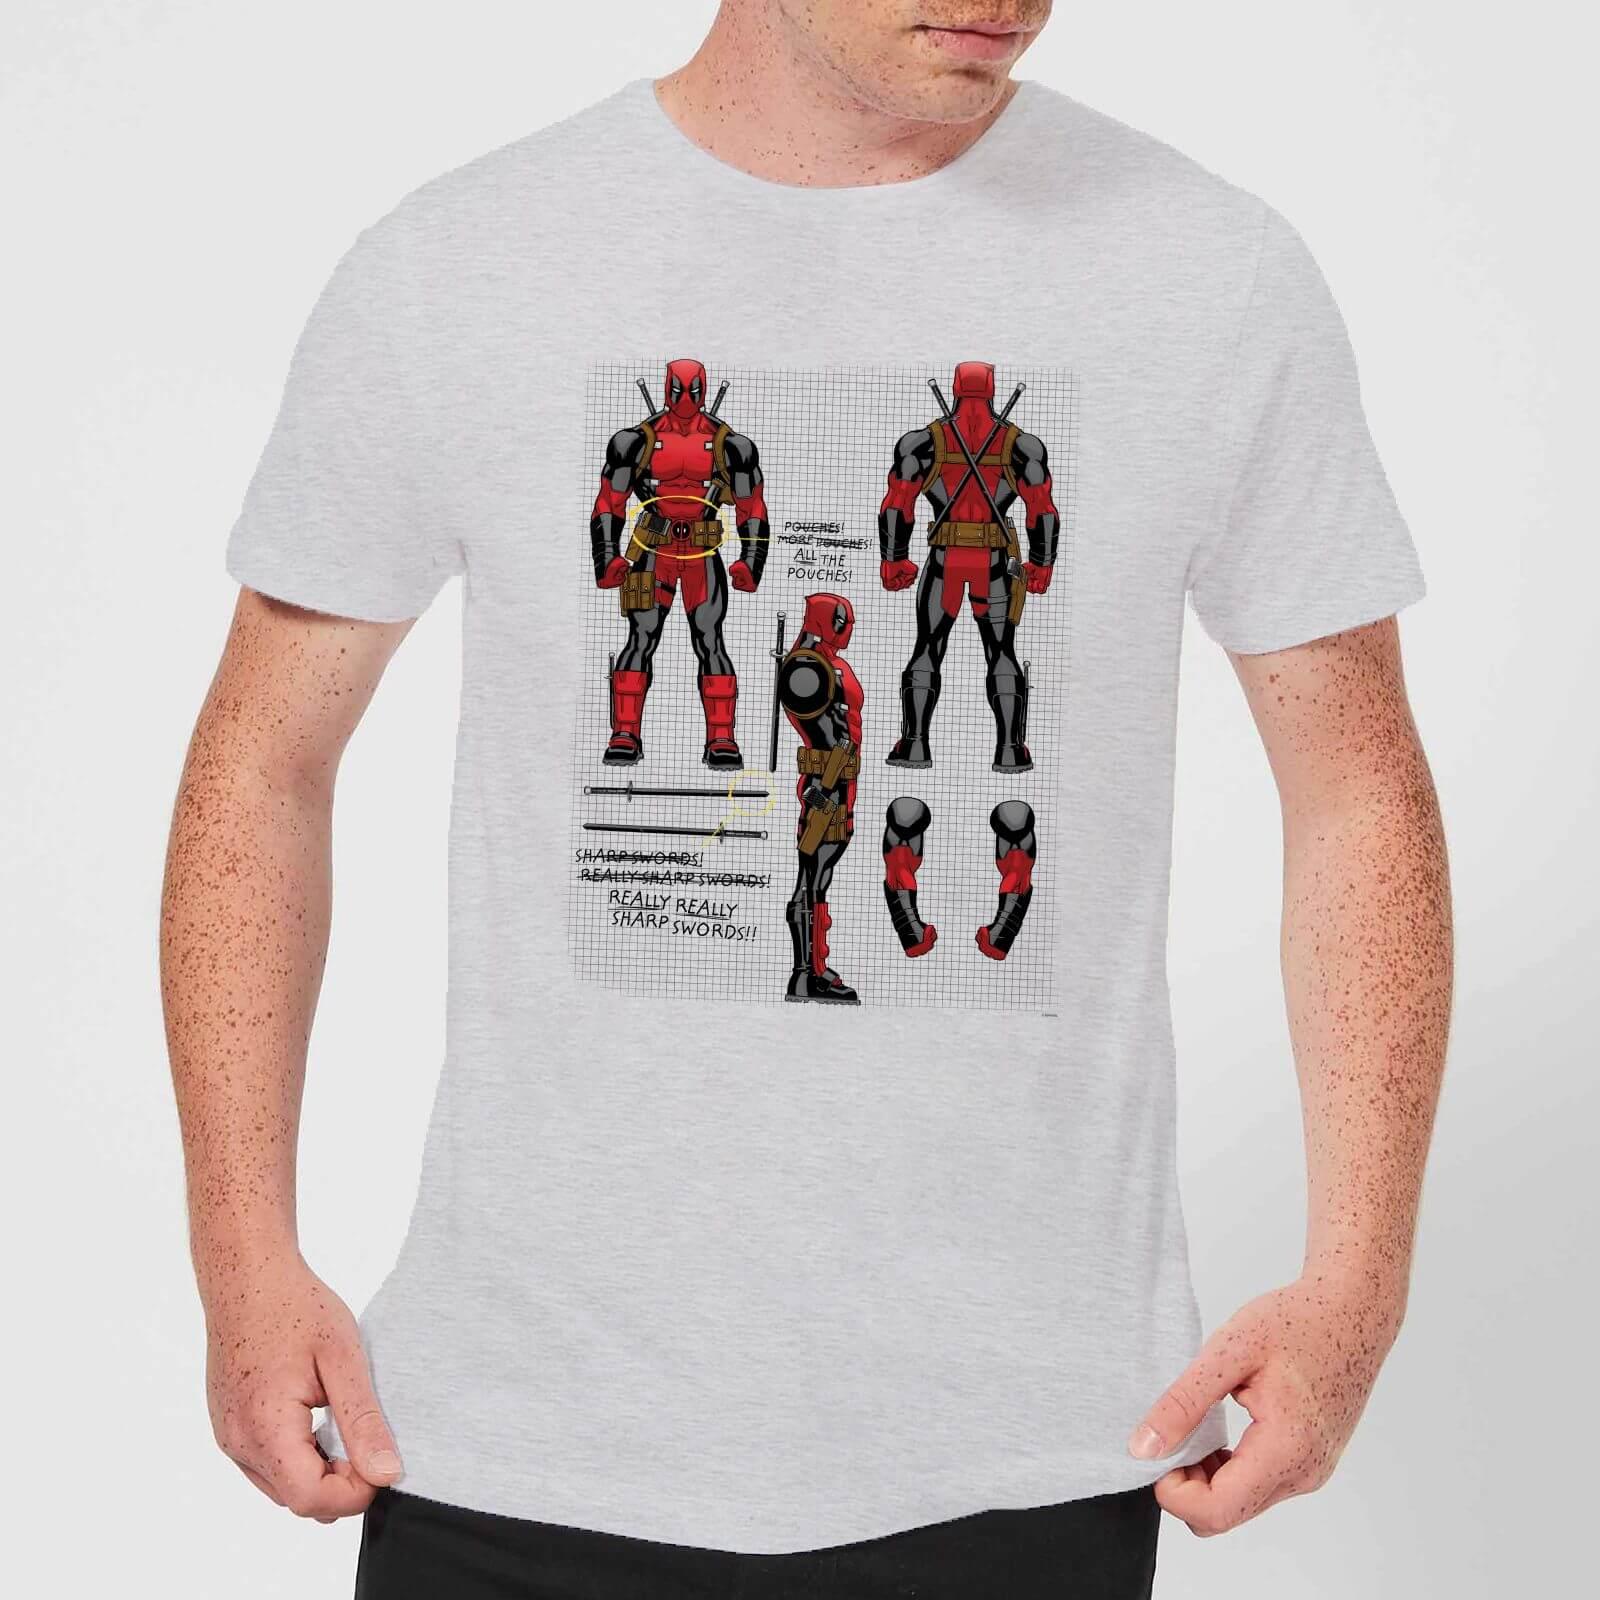 OfferteWeb.click 37-t-shirt-marvel-deadpool-action-figure-plans-grigio-uomo